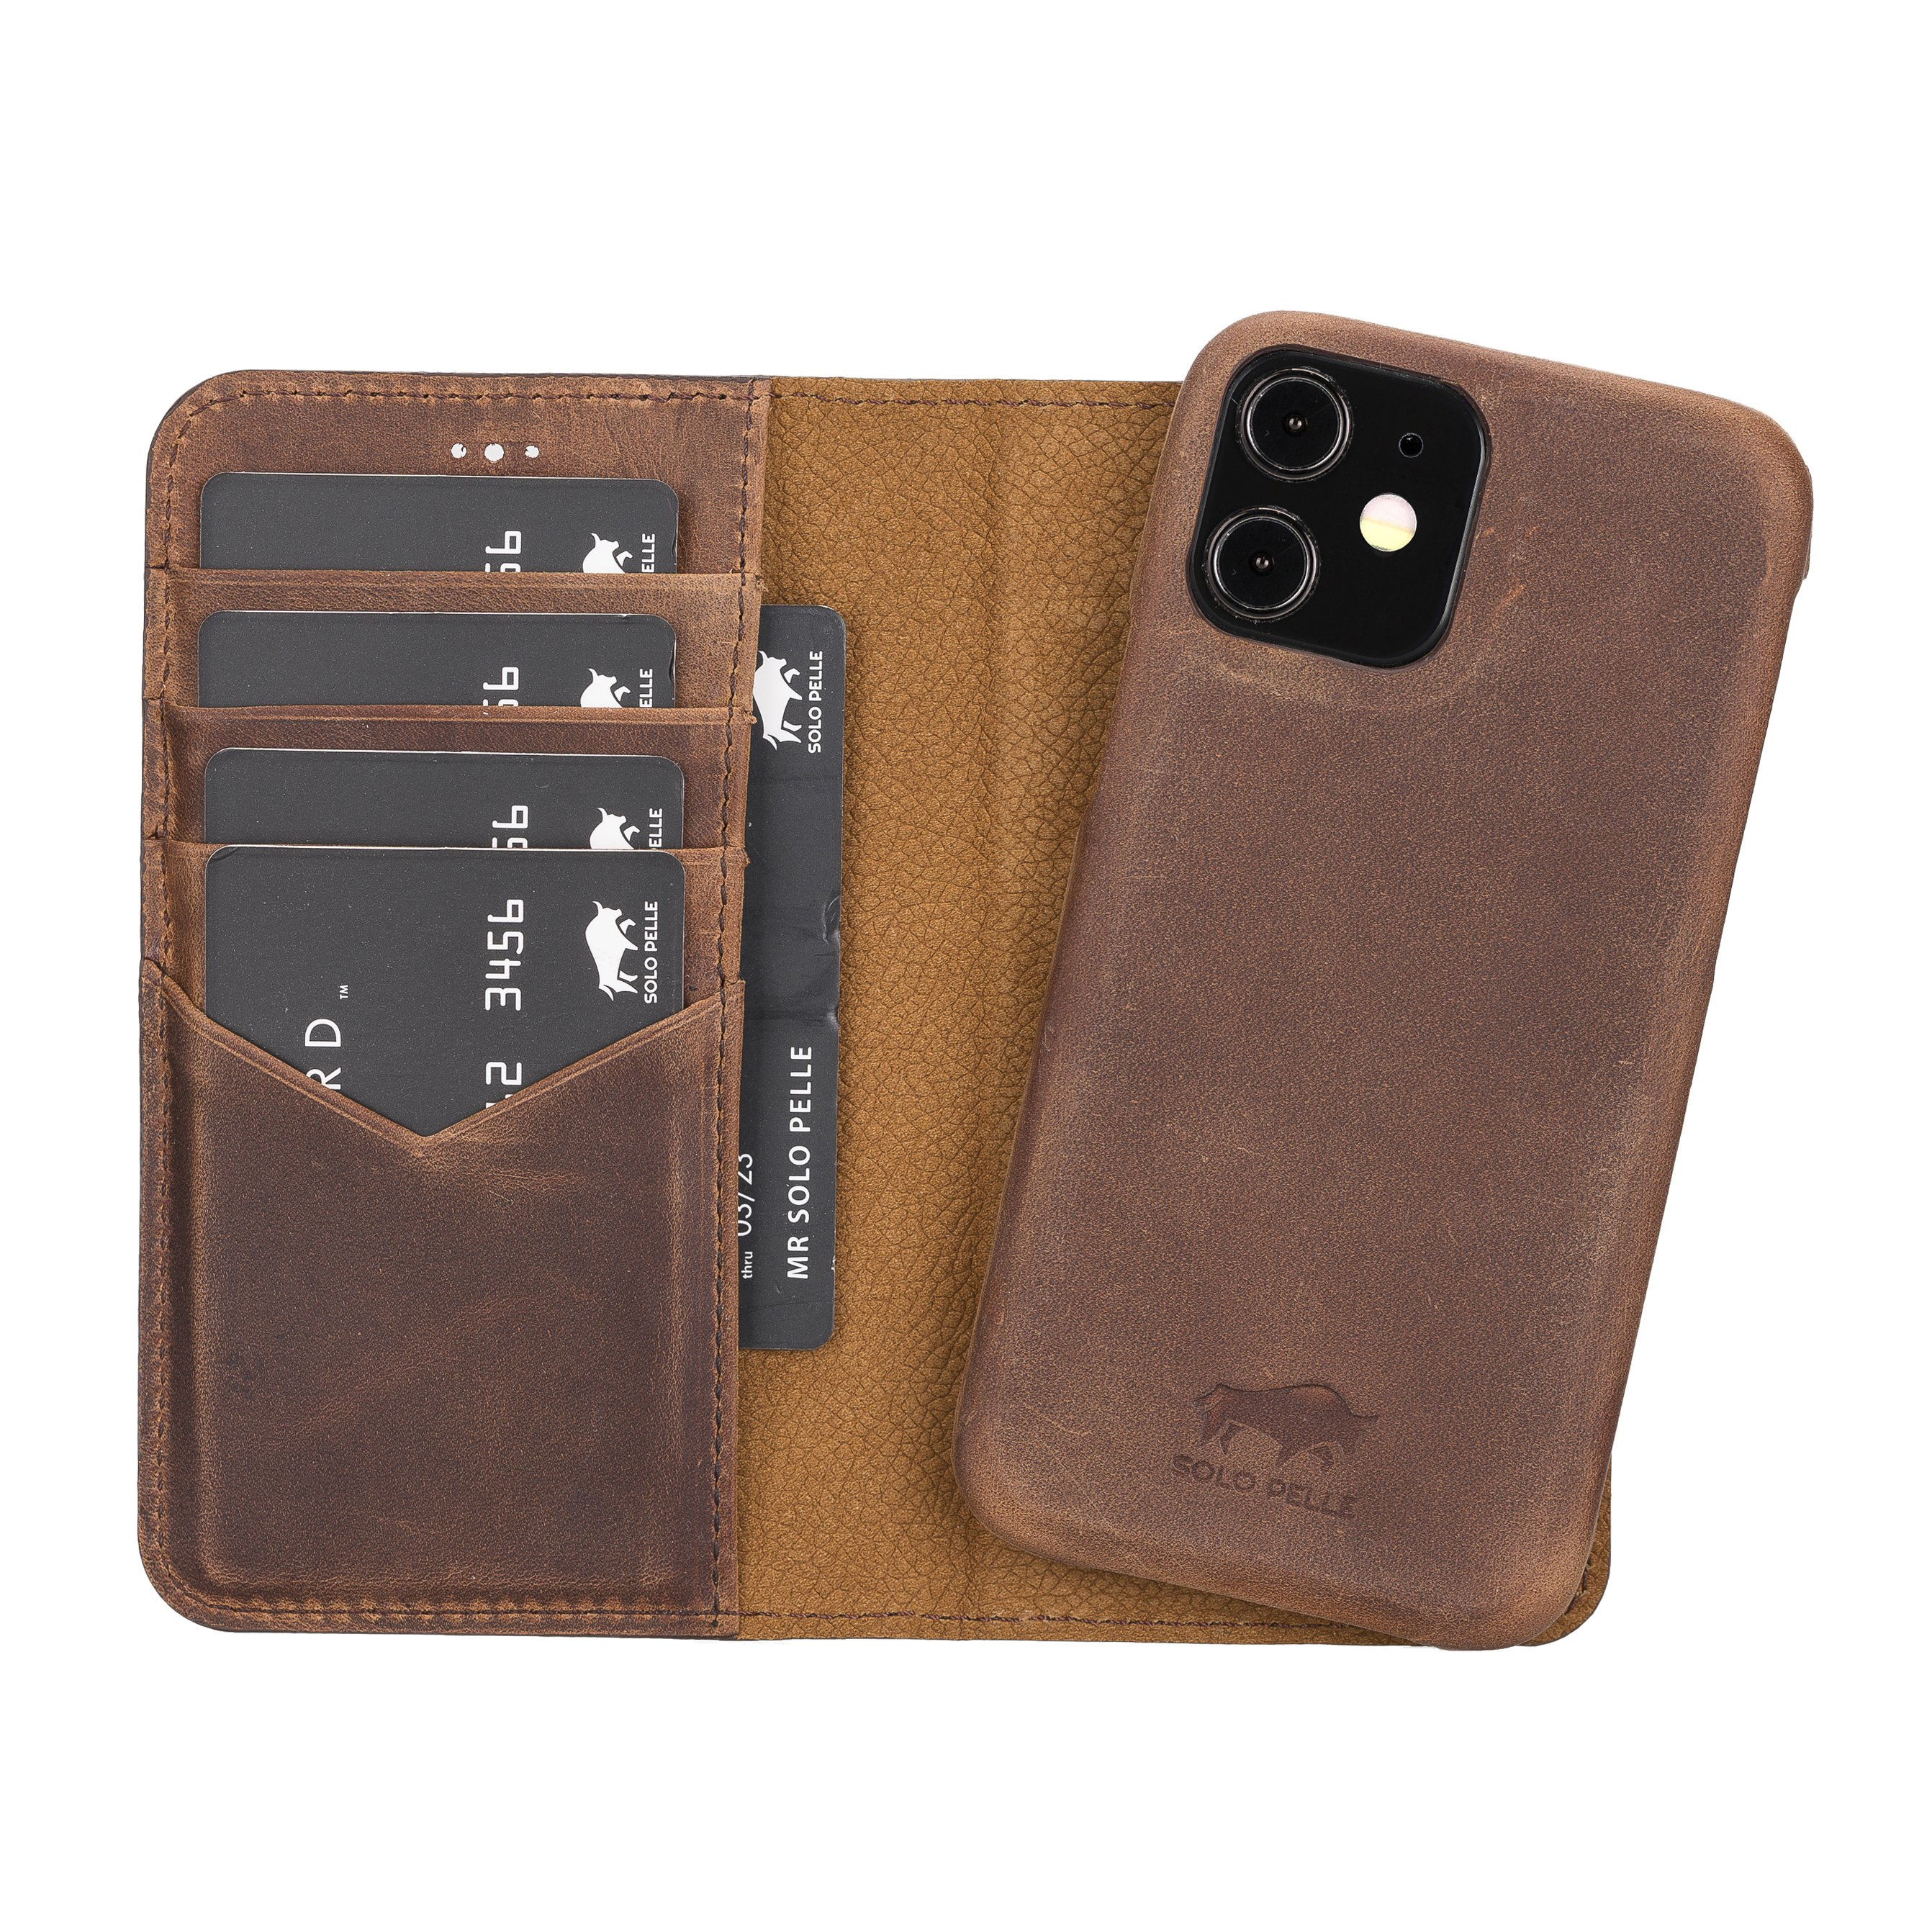 "iPhone 12 Mini abnehmbare Lederhülle ""Clemson"" MagSafe kompatibel (Vollleder Vintage Braun)"